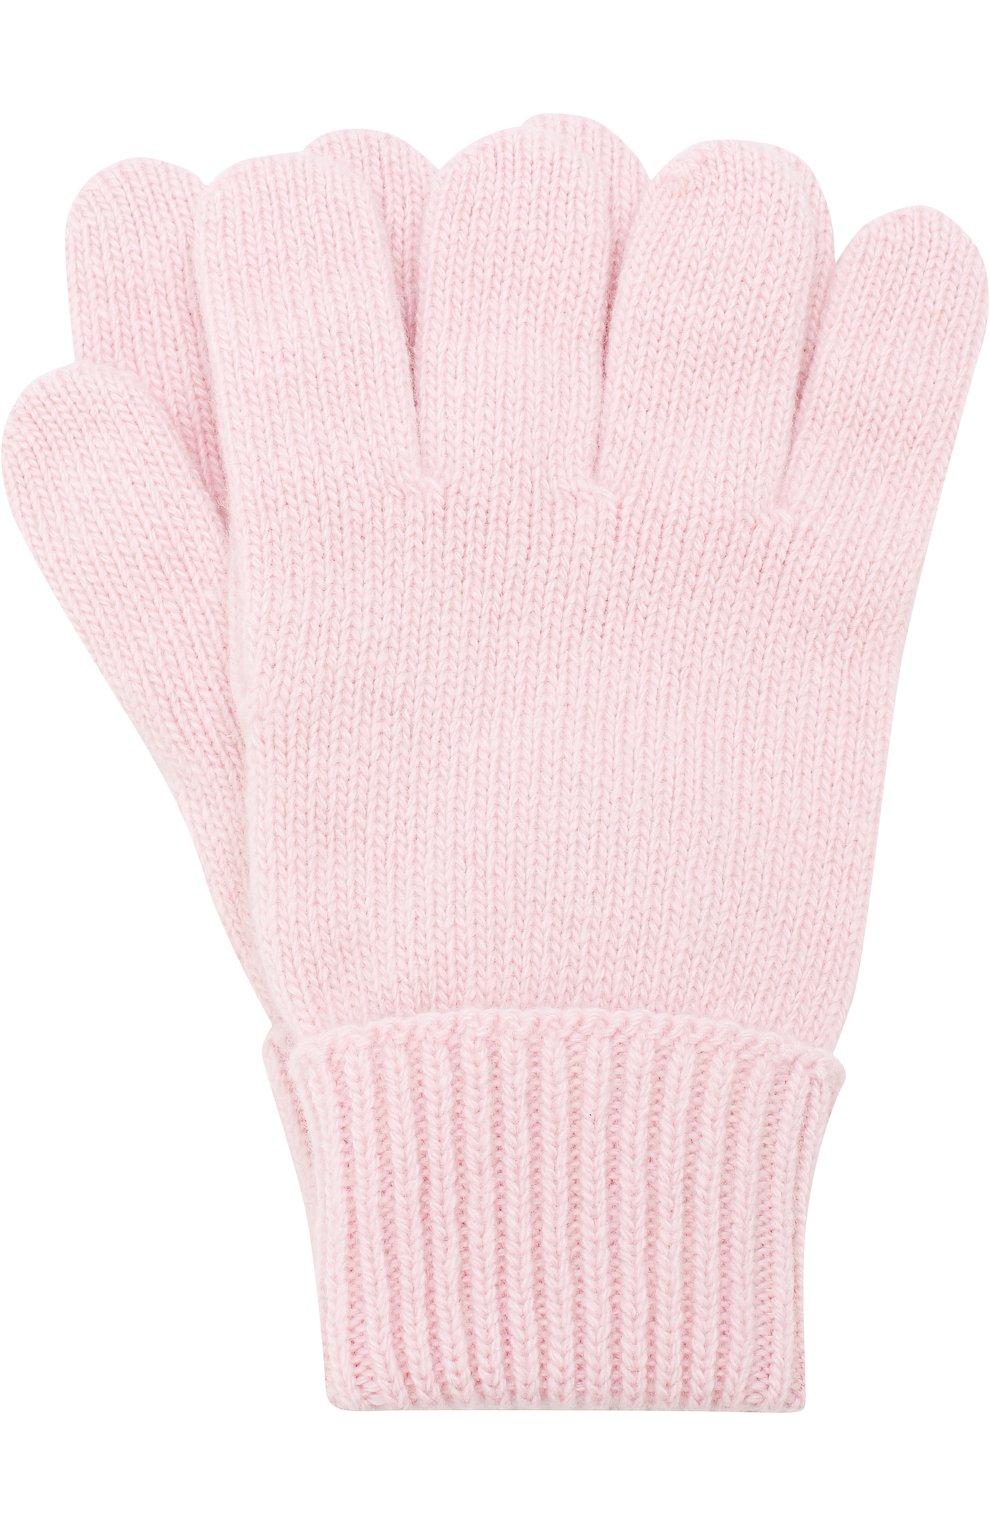 Детские перчатки из смеси шерсти и кашемира IL TRENINO светло-розового цвета, арт. 17 5139/E0 | Фото 1